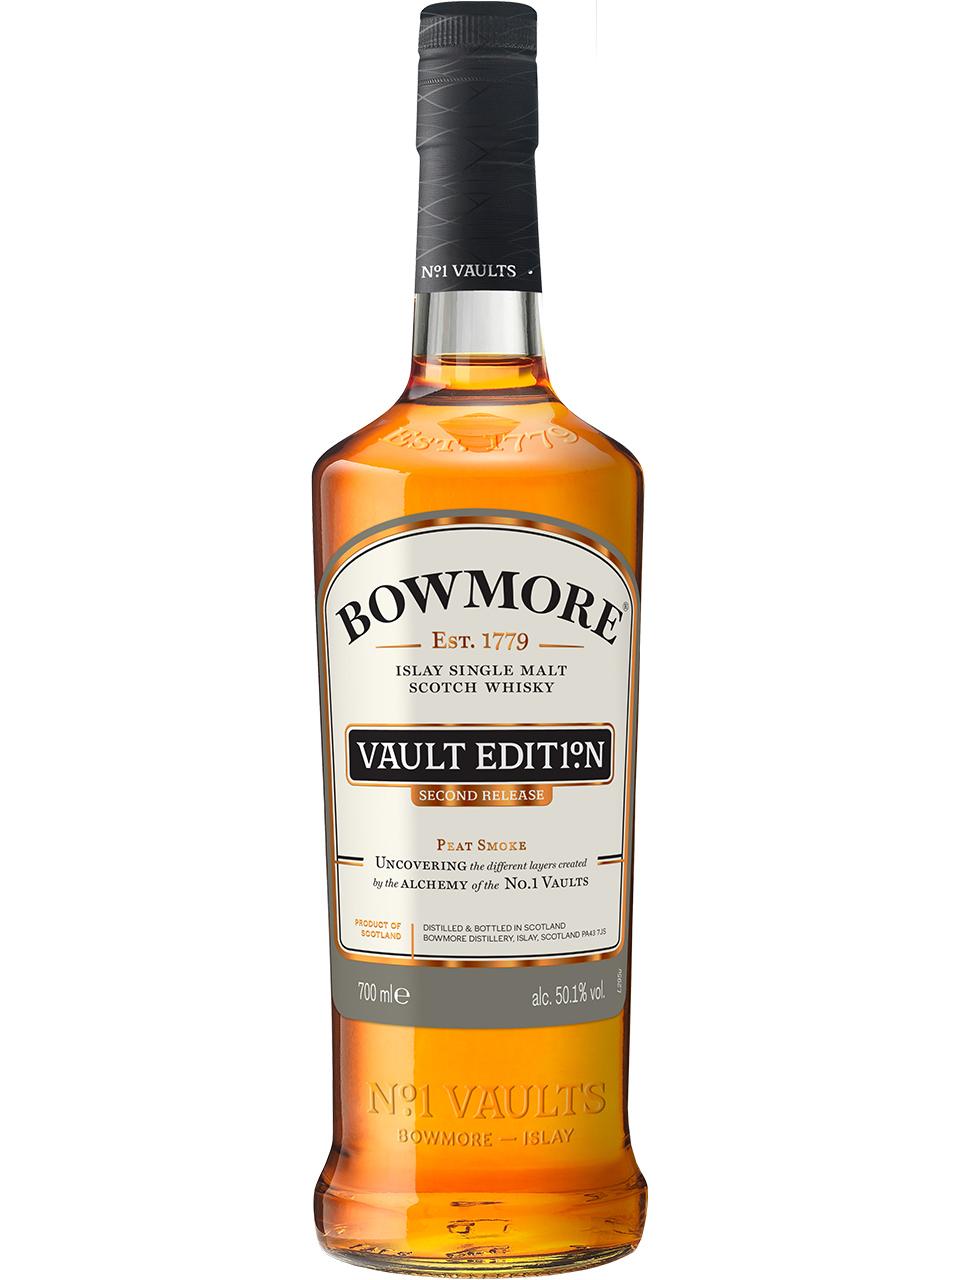 Bowmore Vaults Edition 2 Peat Smoke Single Malt